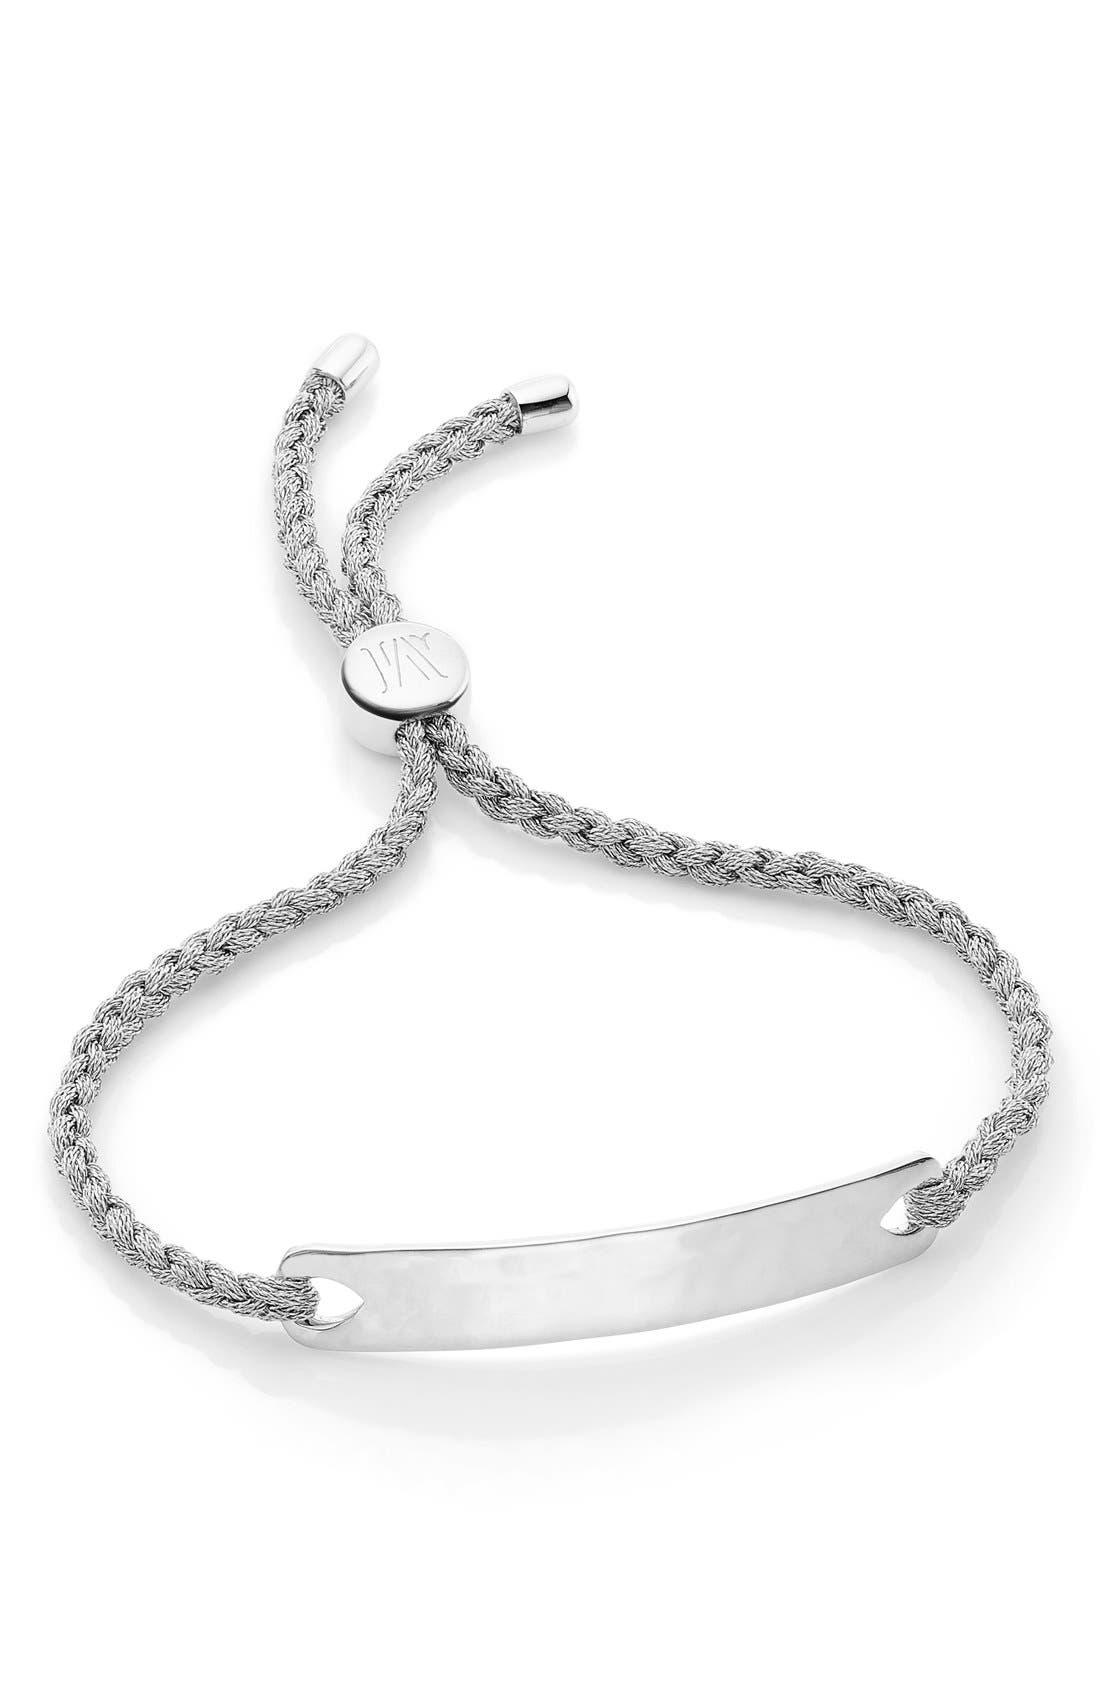 Main Image - Monica VinaderHavanaFriendship Bracelet